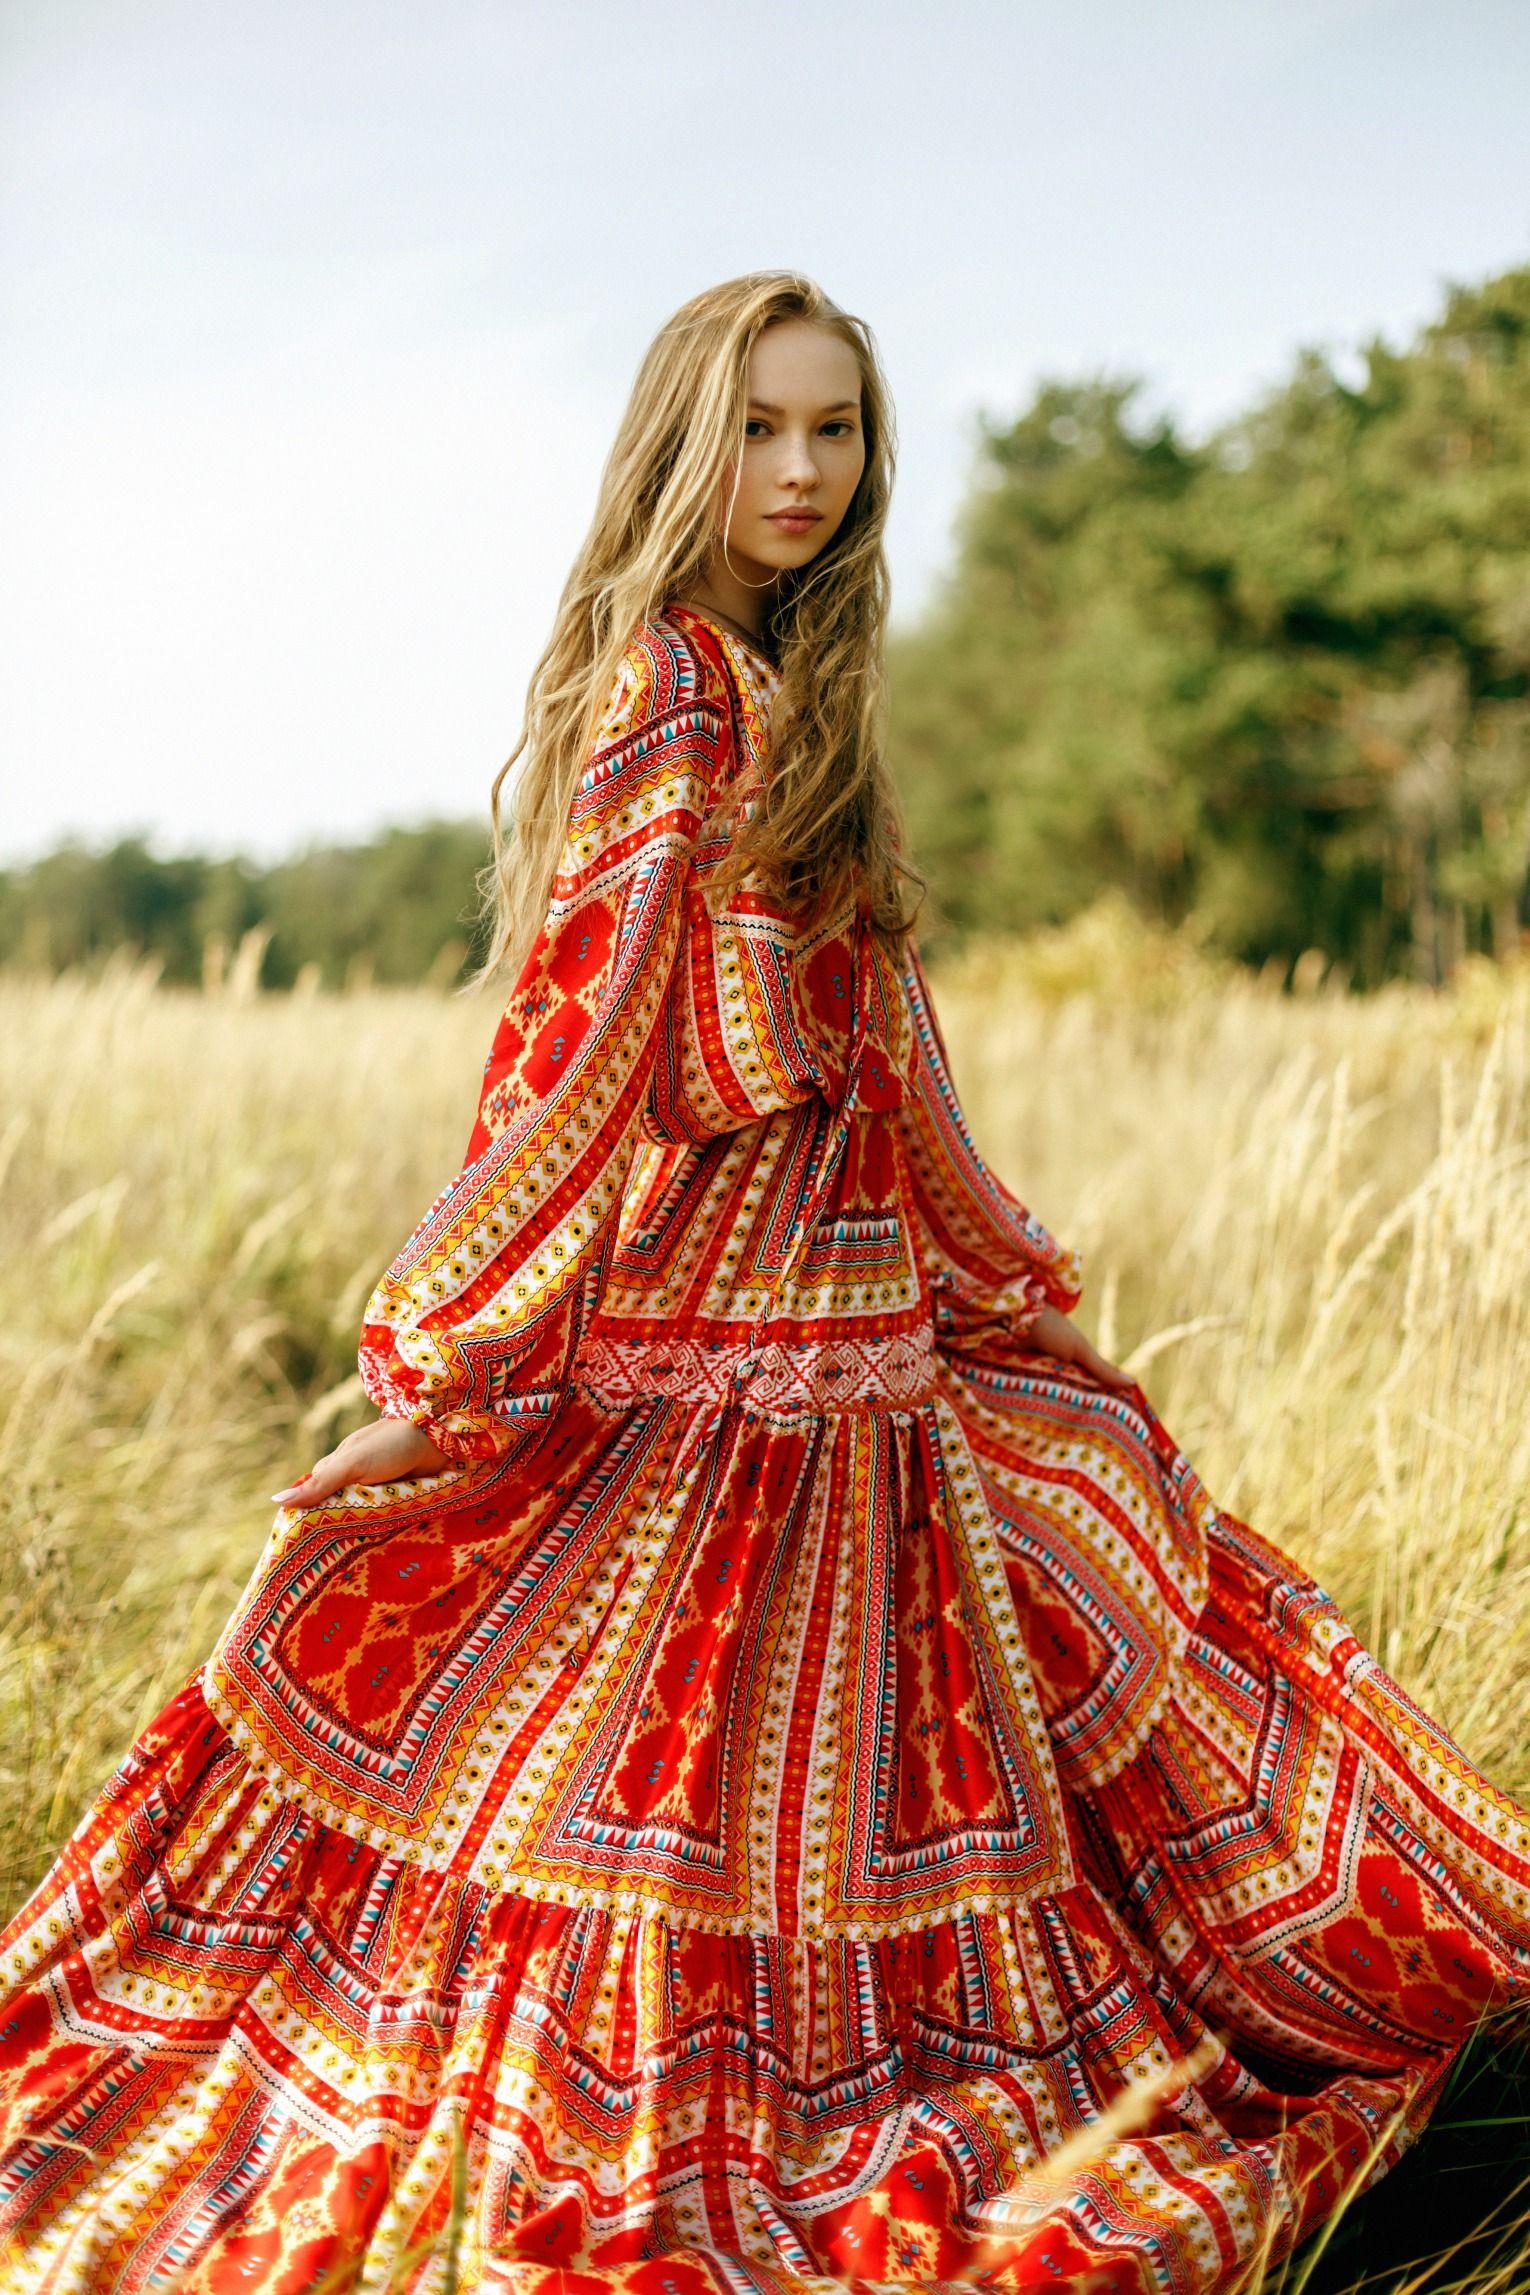 Yanina Trunkshow | Moda Operandi